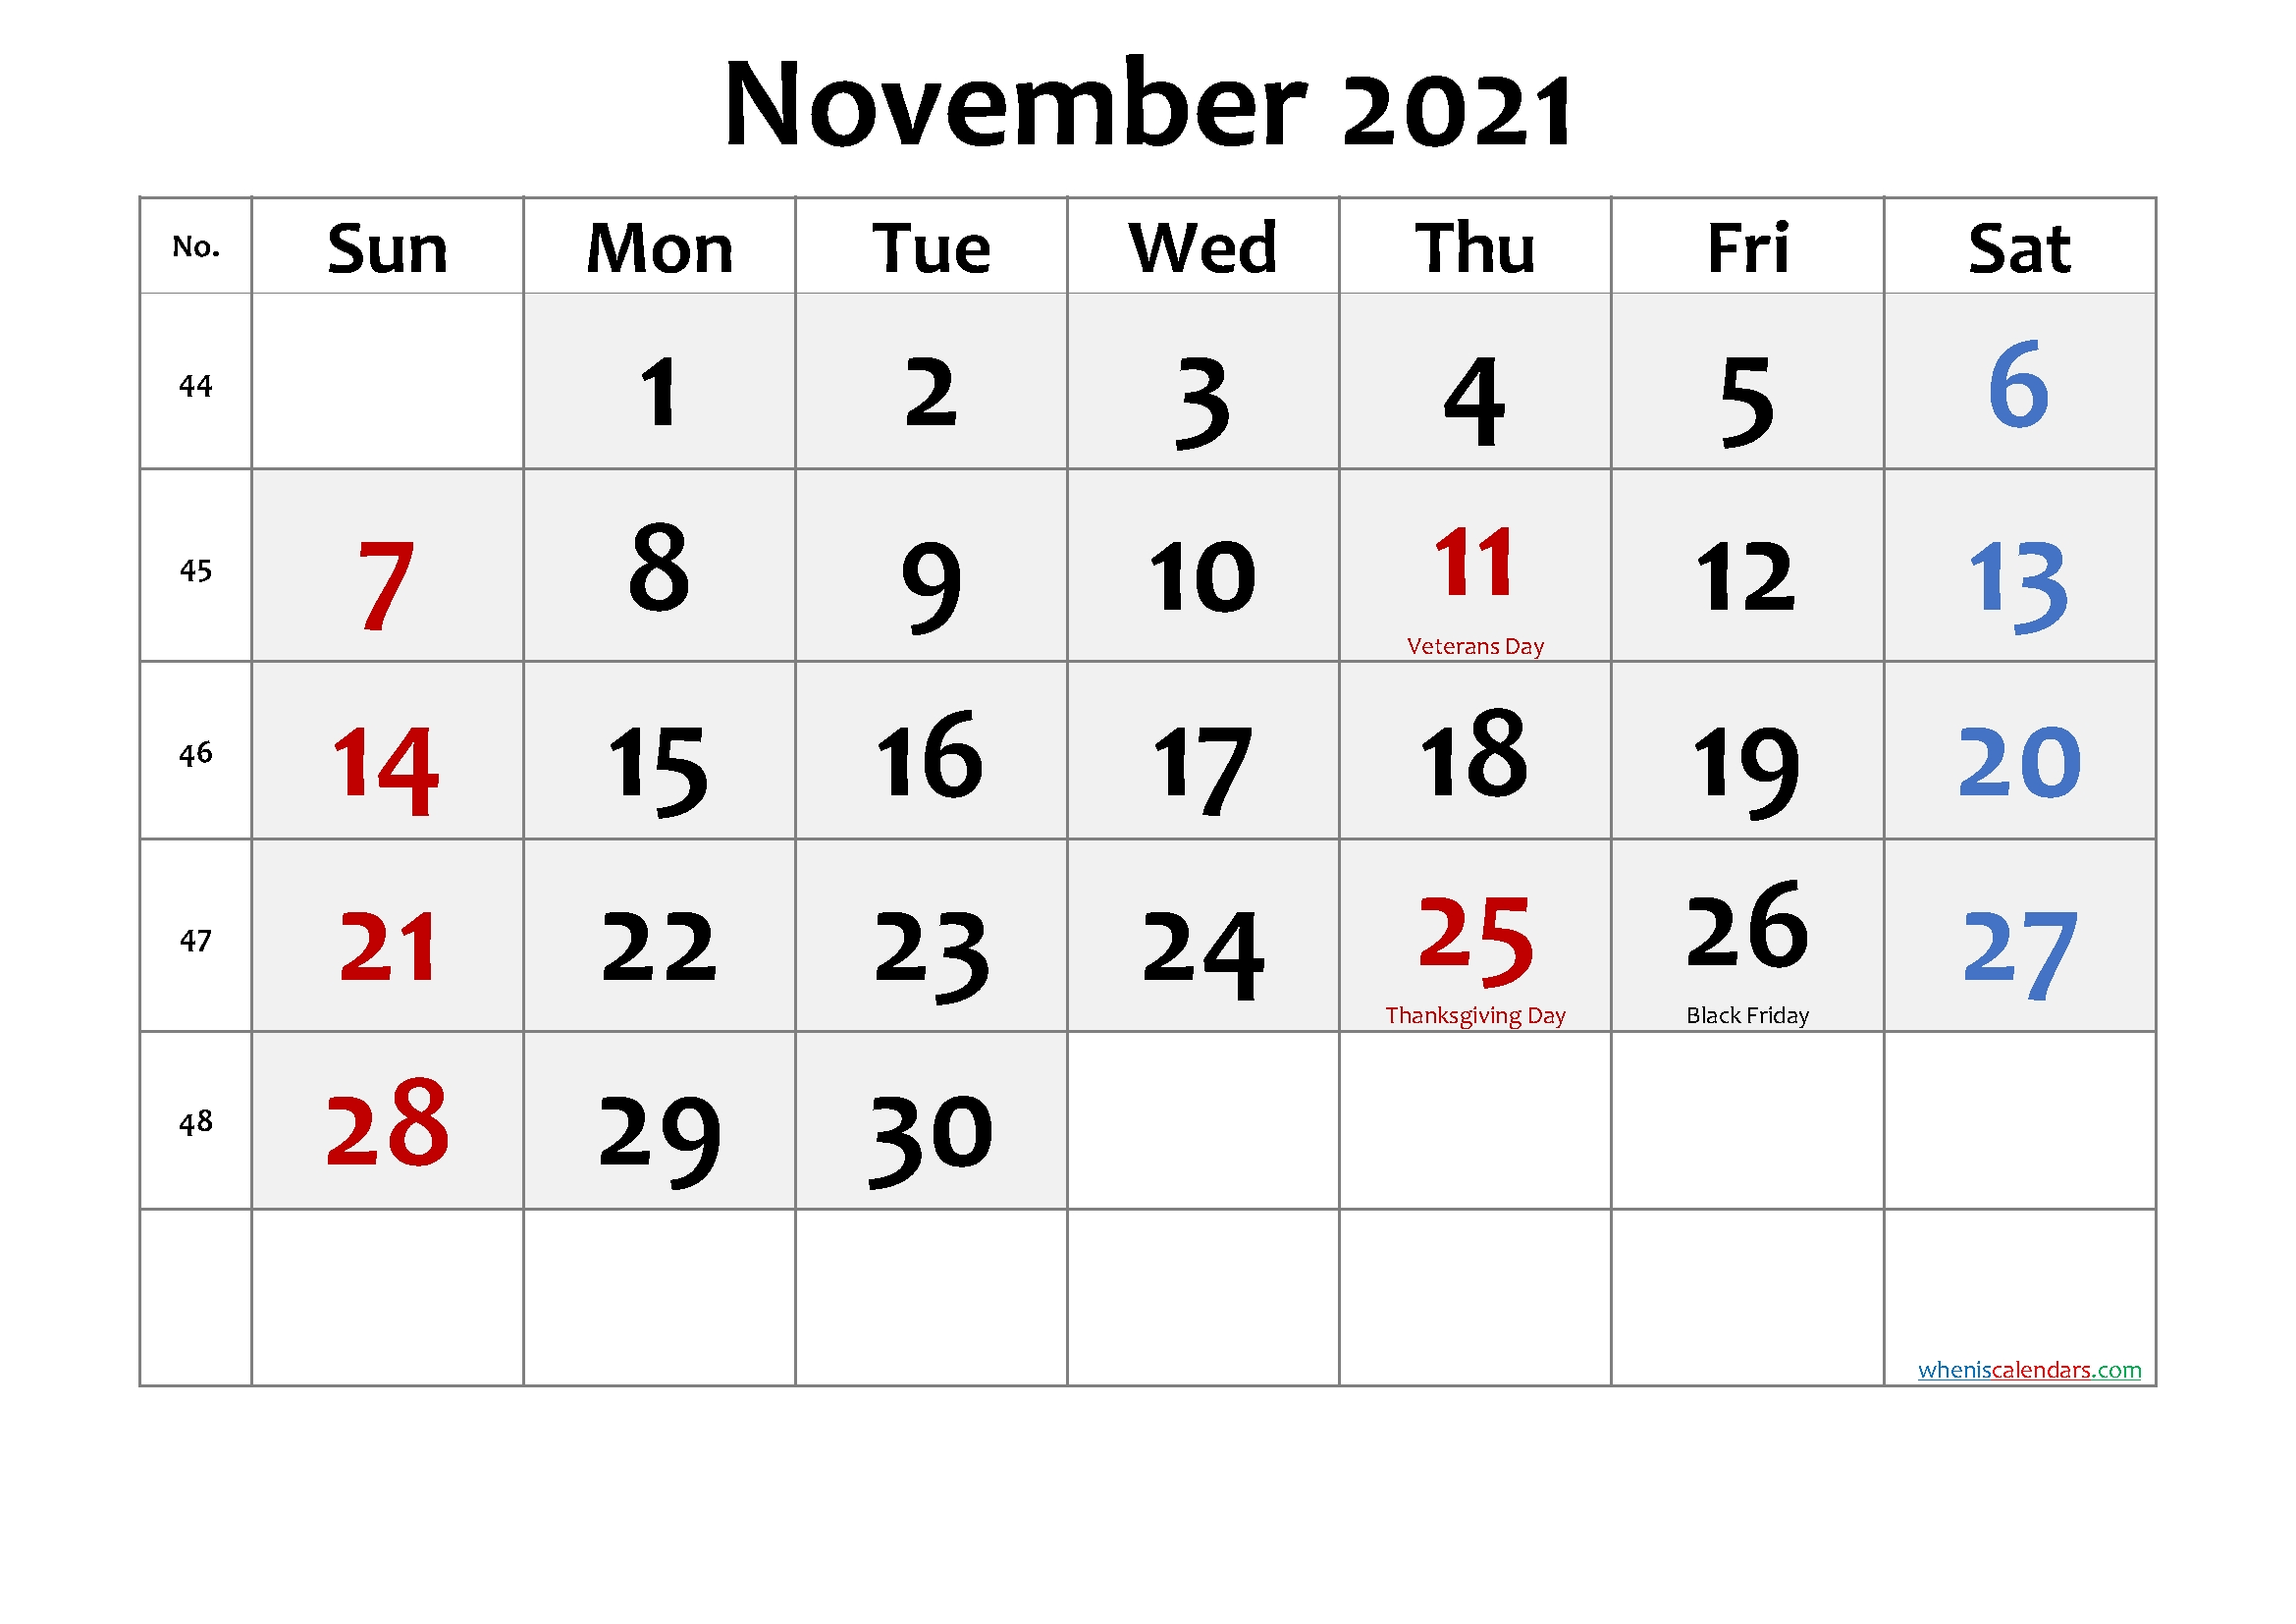 Free Printable November 2021 Calendar With Holidays Calendar For November 2021 With Holidays